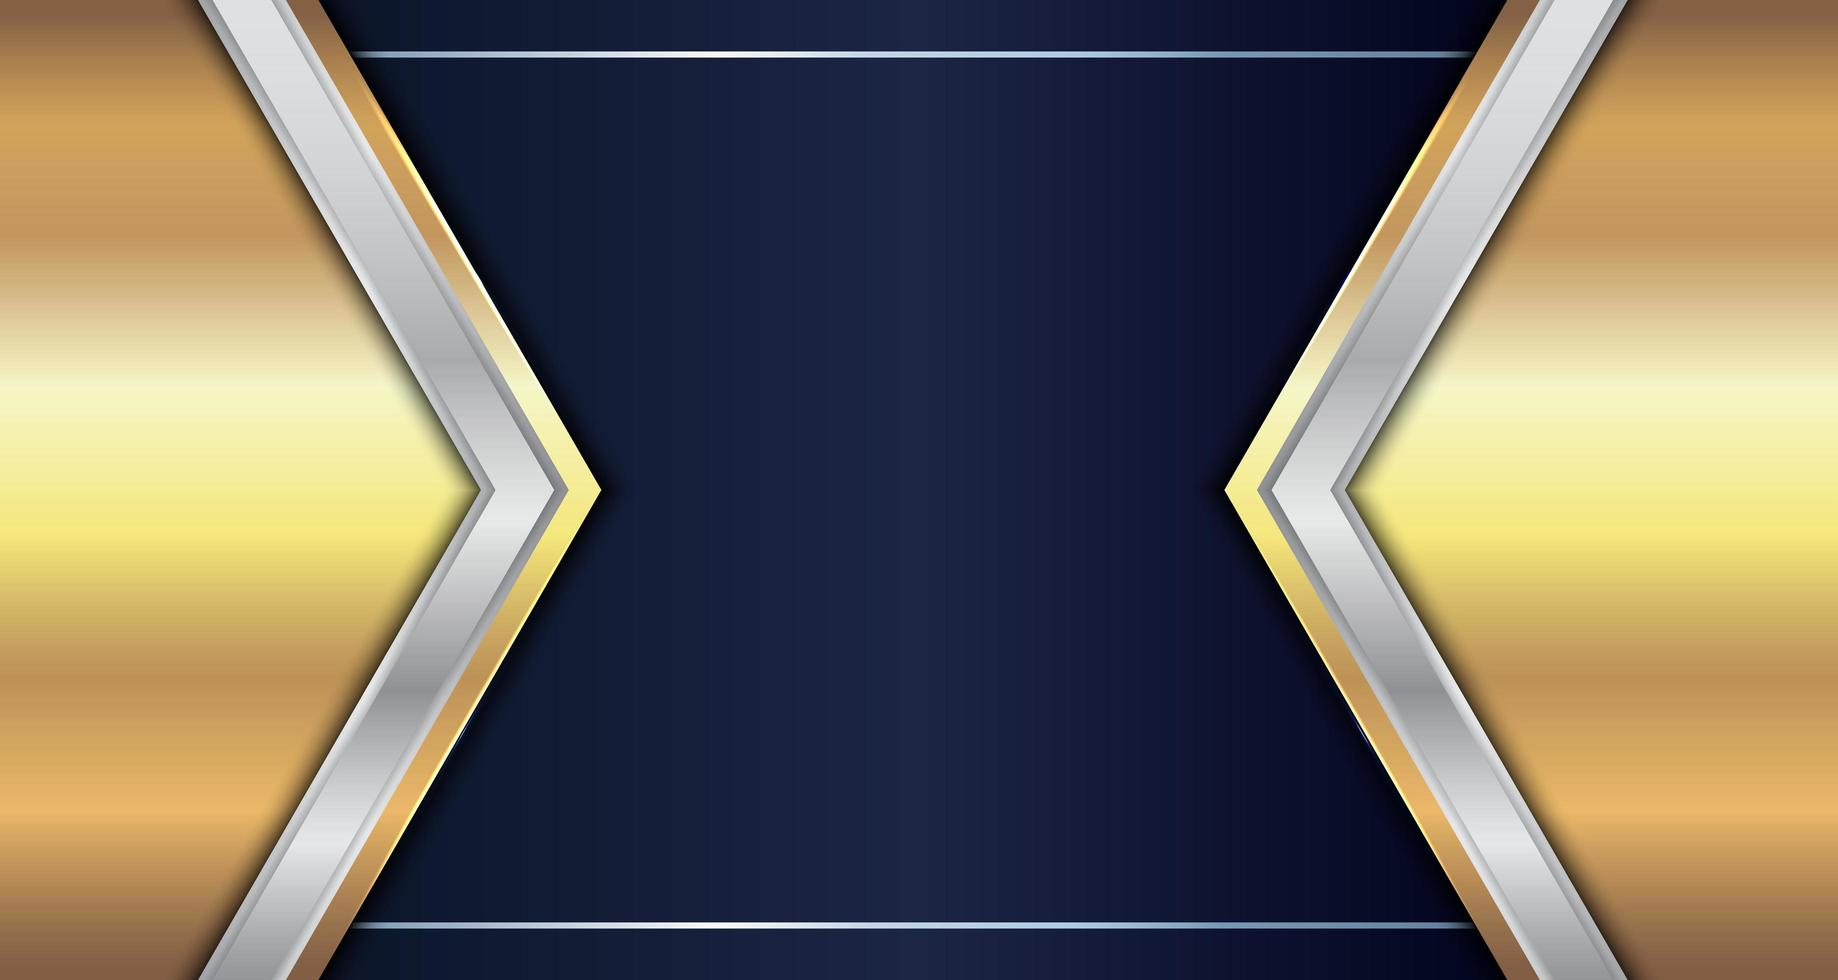 abstrakt guld- och silvermetallisk geometrisk triangelrubrik vektor